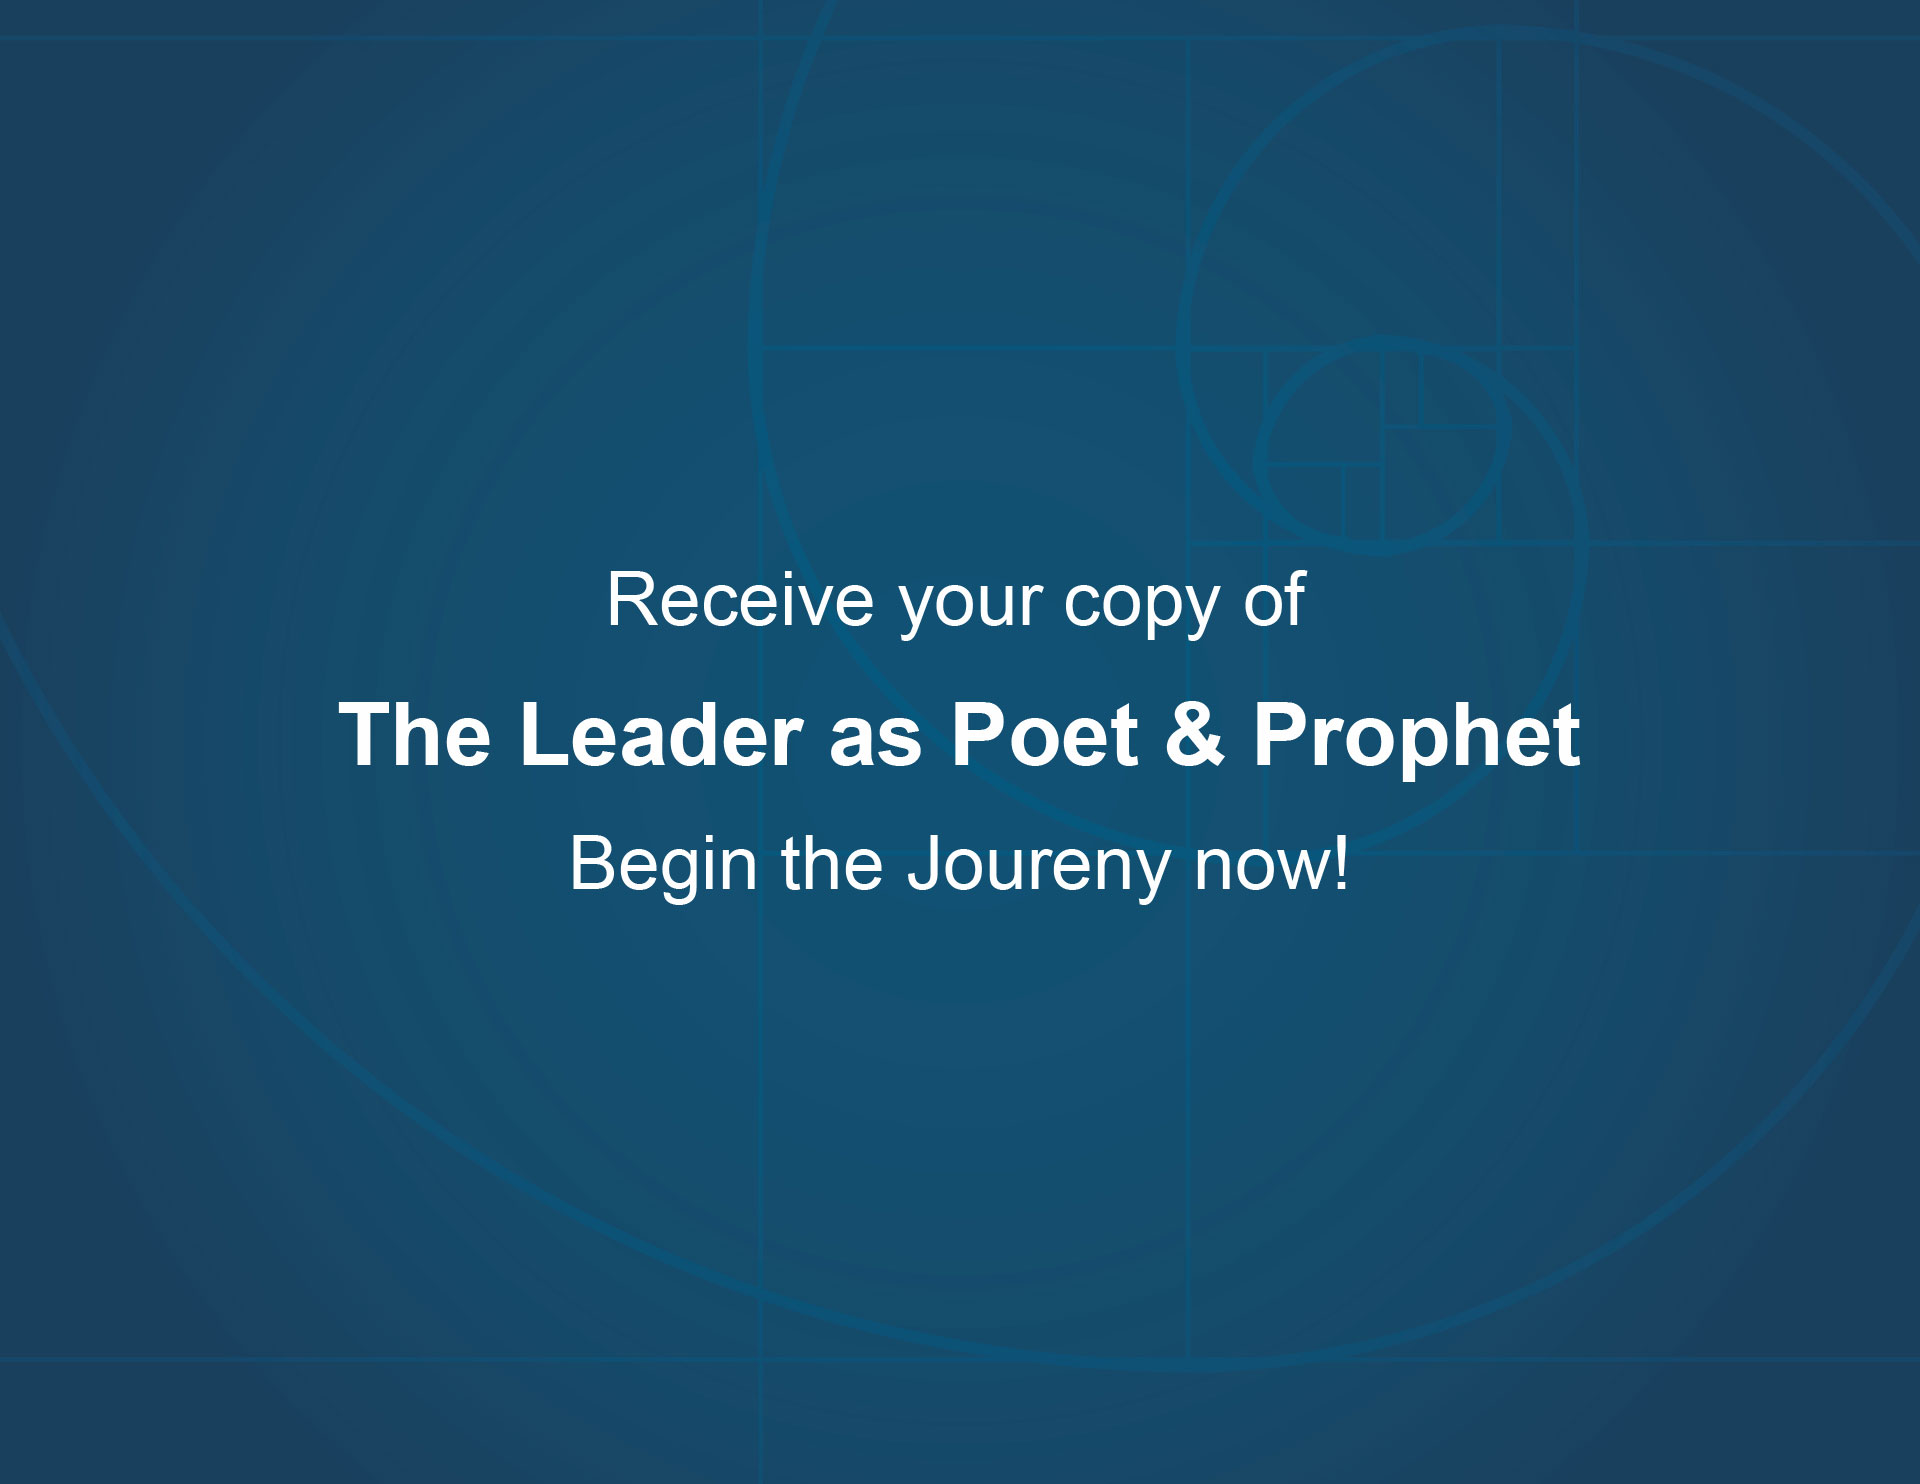 Poets & Prophets